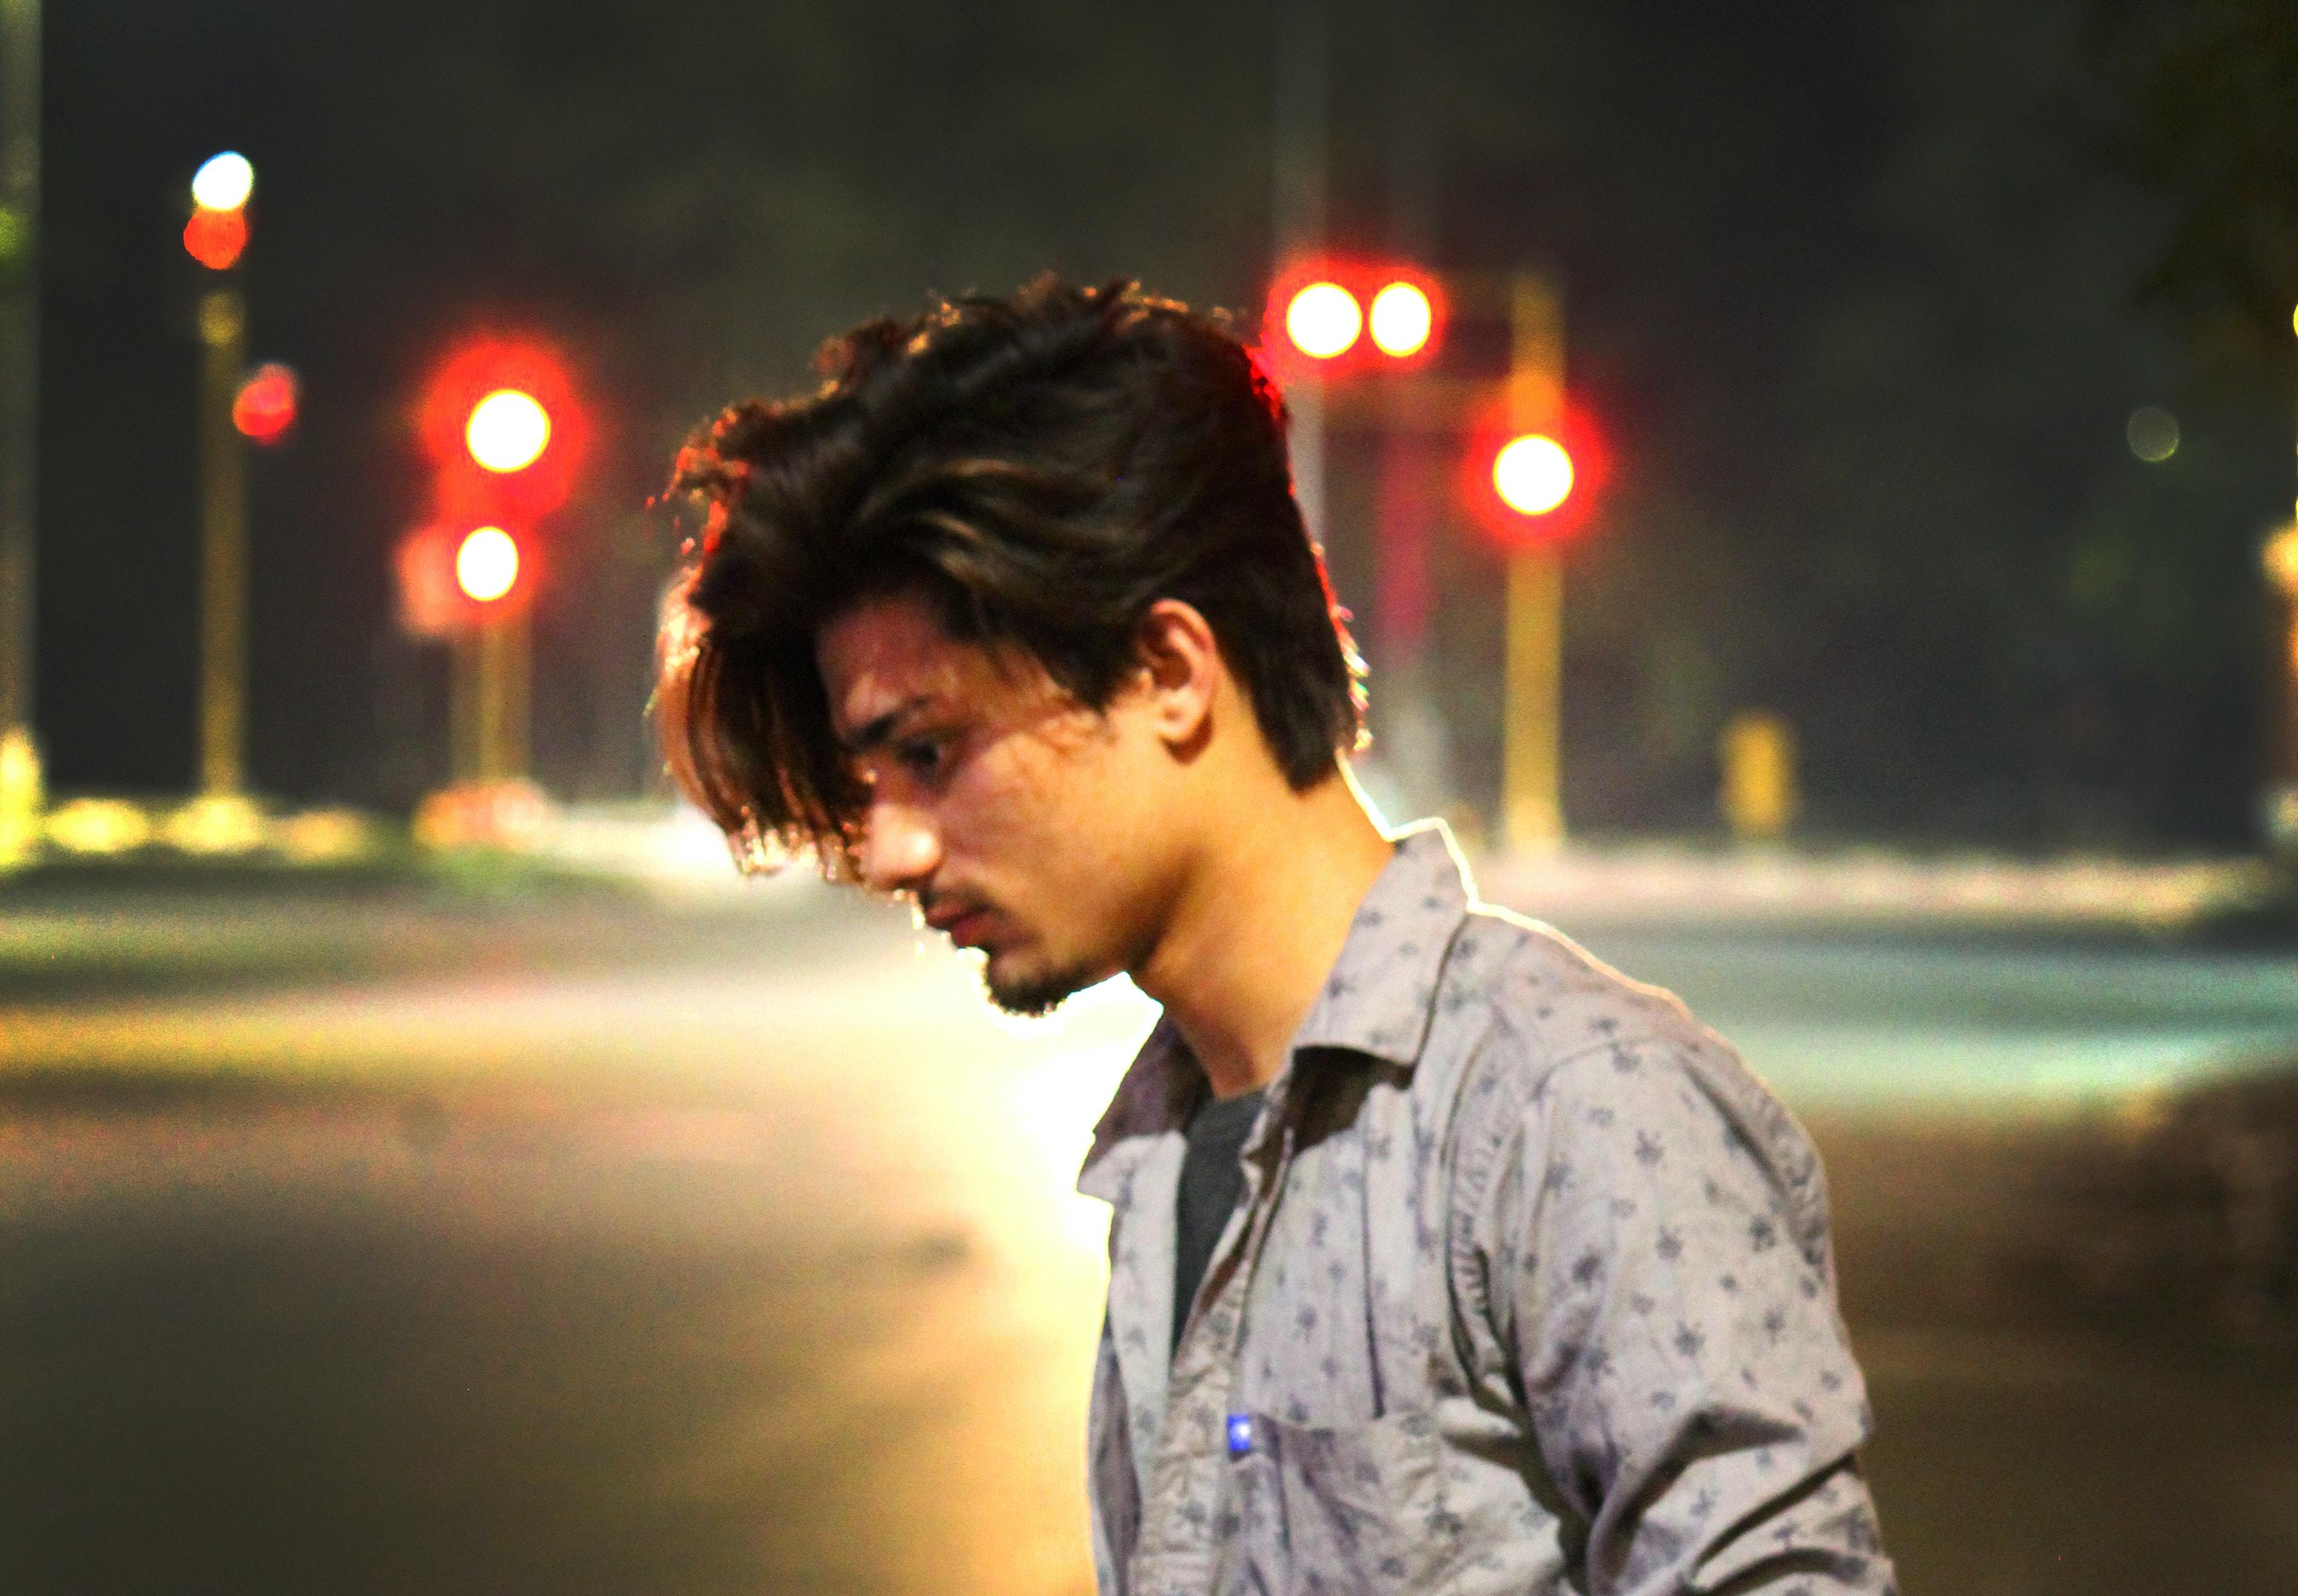 Free stock photo of #nightlights #photography #streetclick #wallpapers, men photography, night lights